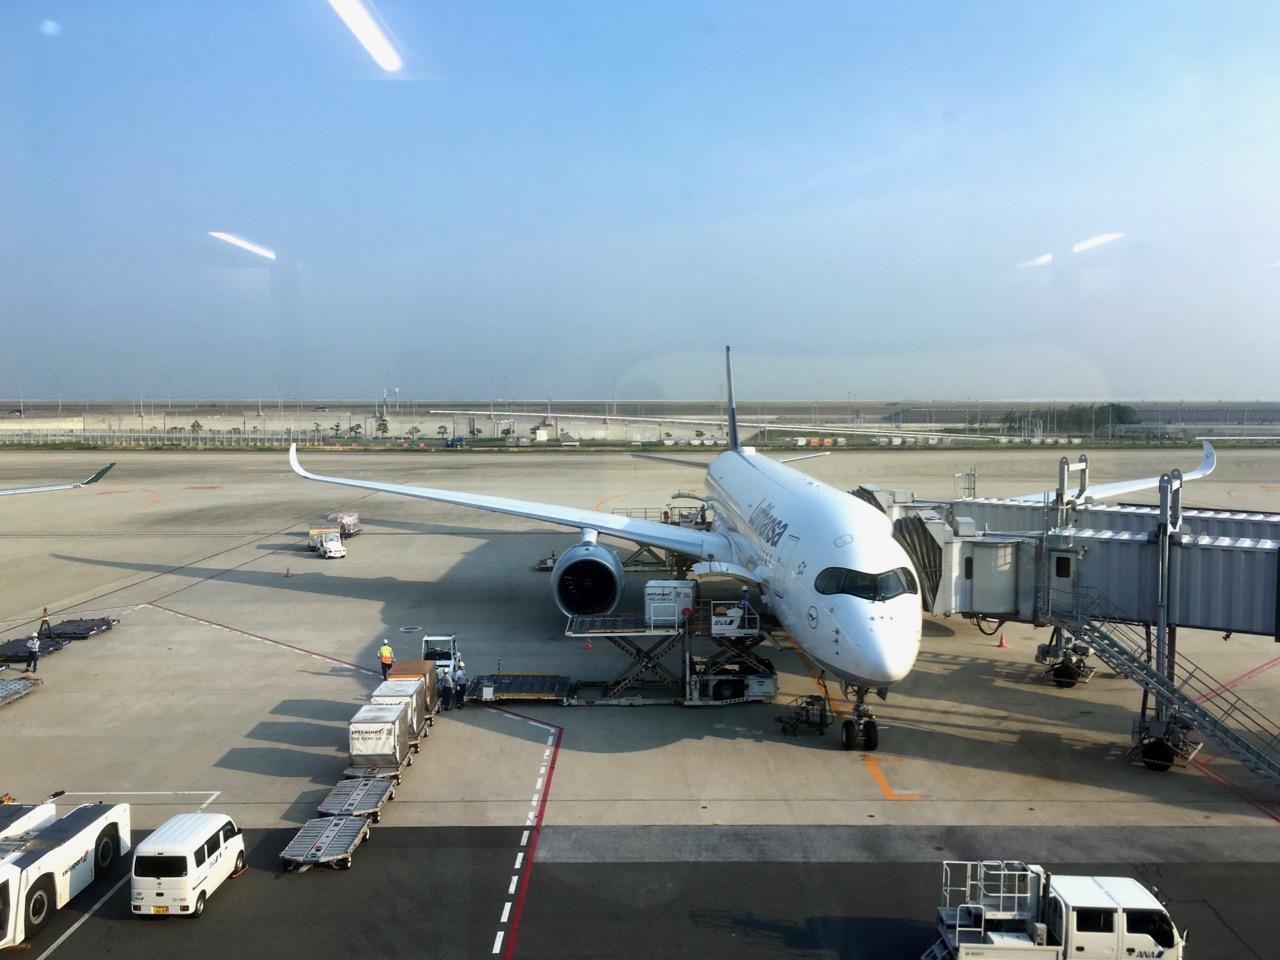 LH Flug nach Japan / ルフトハンザで一時帰国